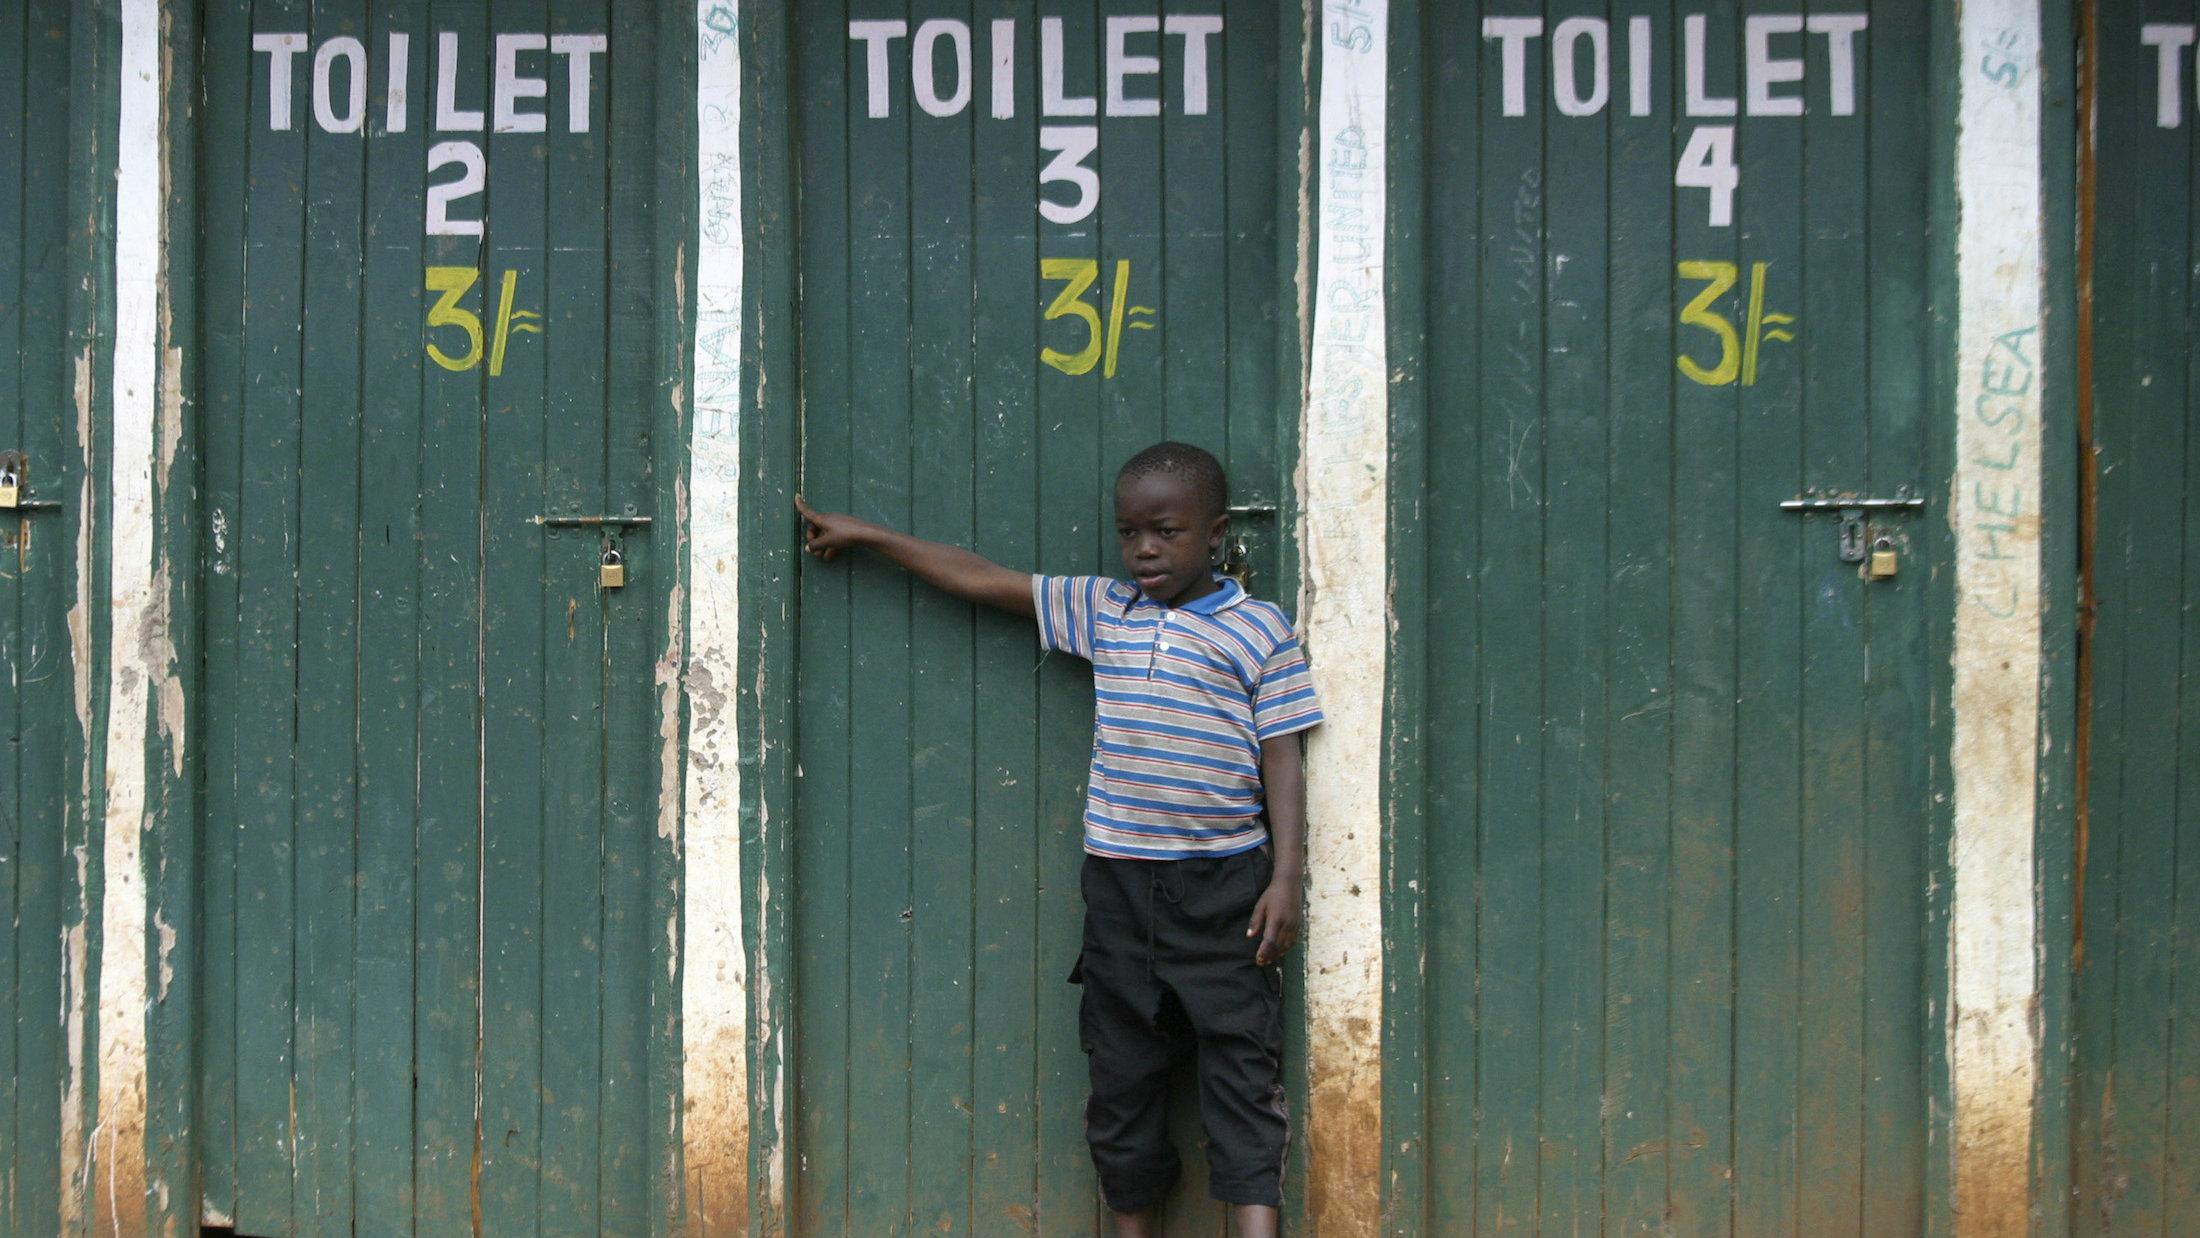 A boy stands next to public bathrooms in Nairobi's slum, Kibera